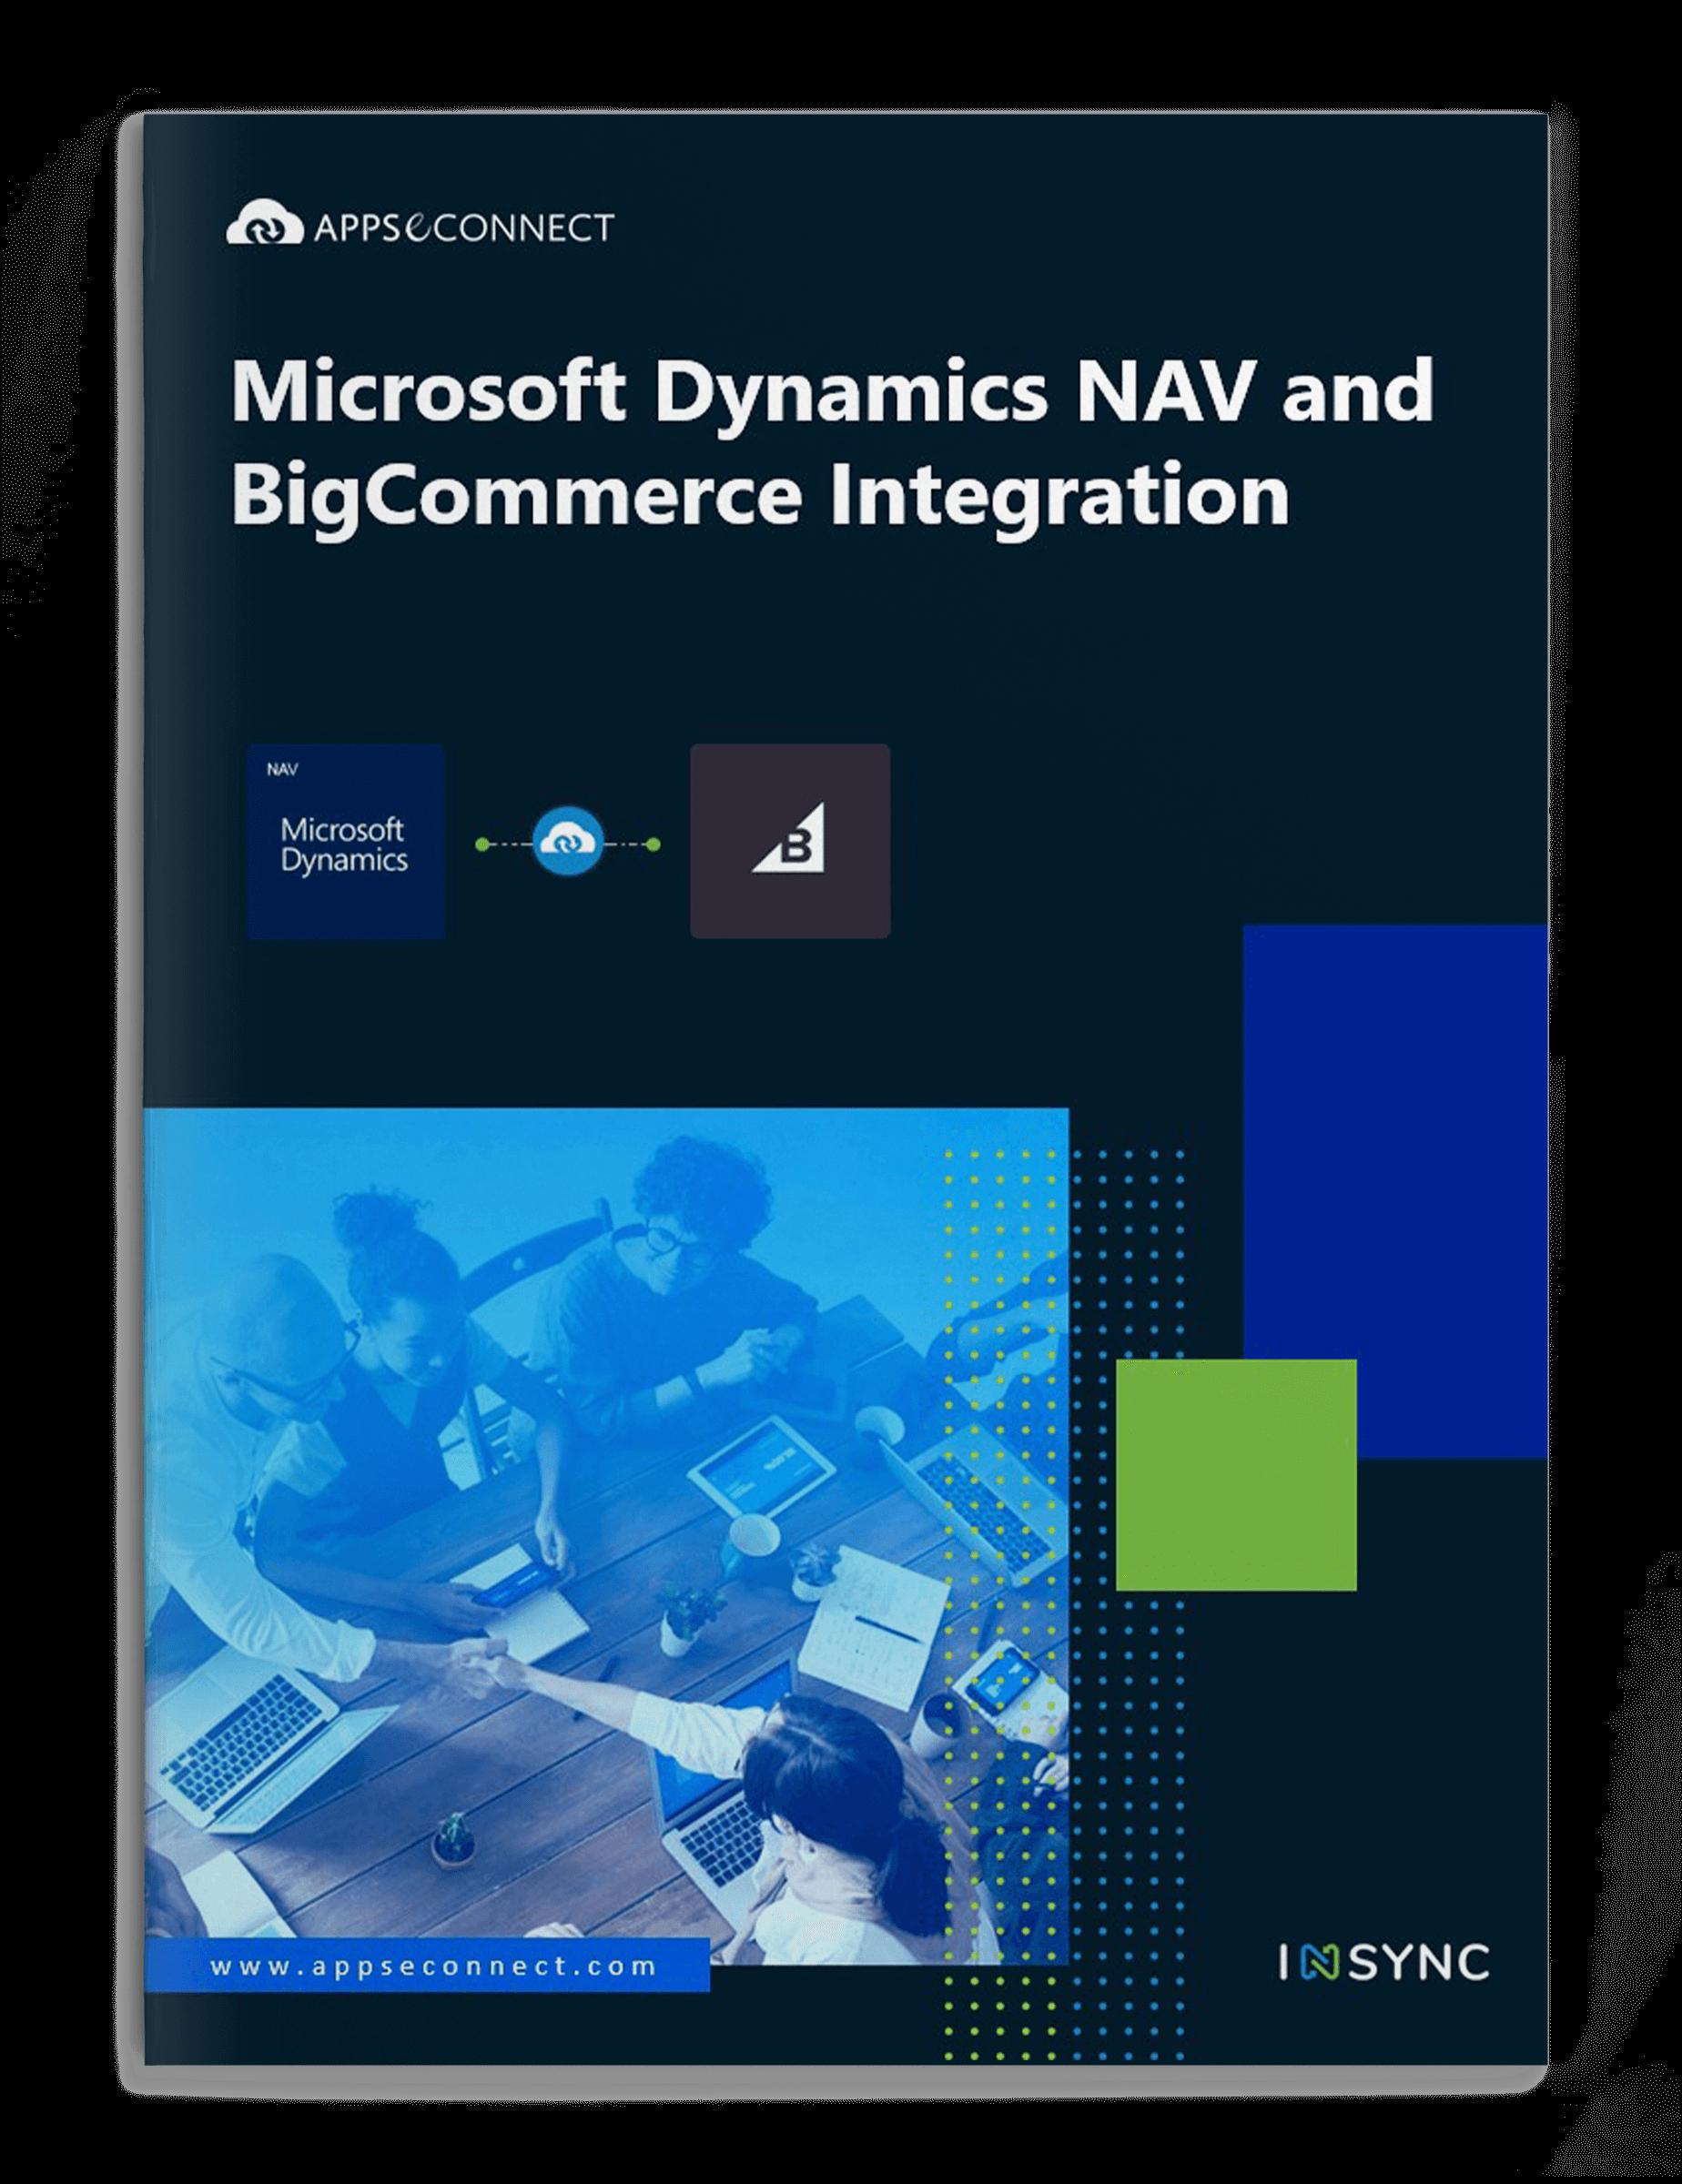 microsoft-dynamics-nav-bigcommerce-integration-brochure-cover